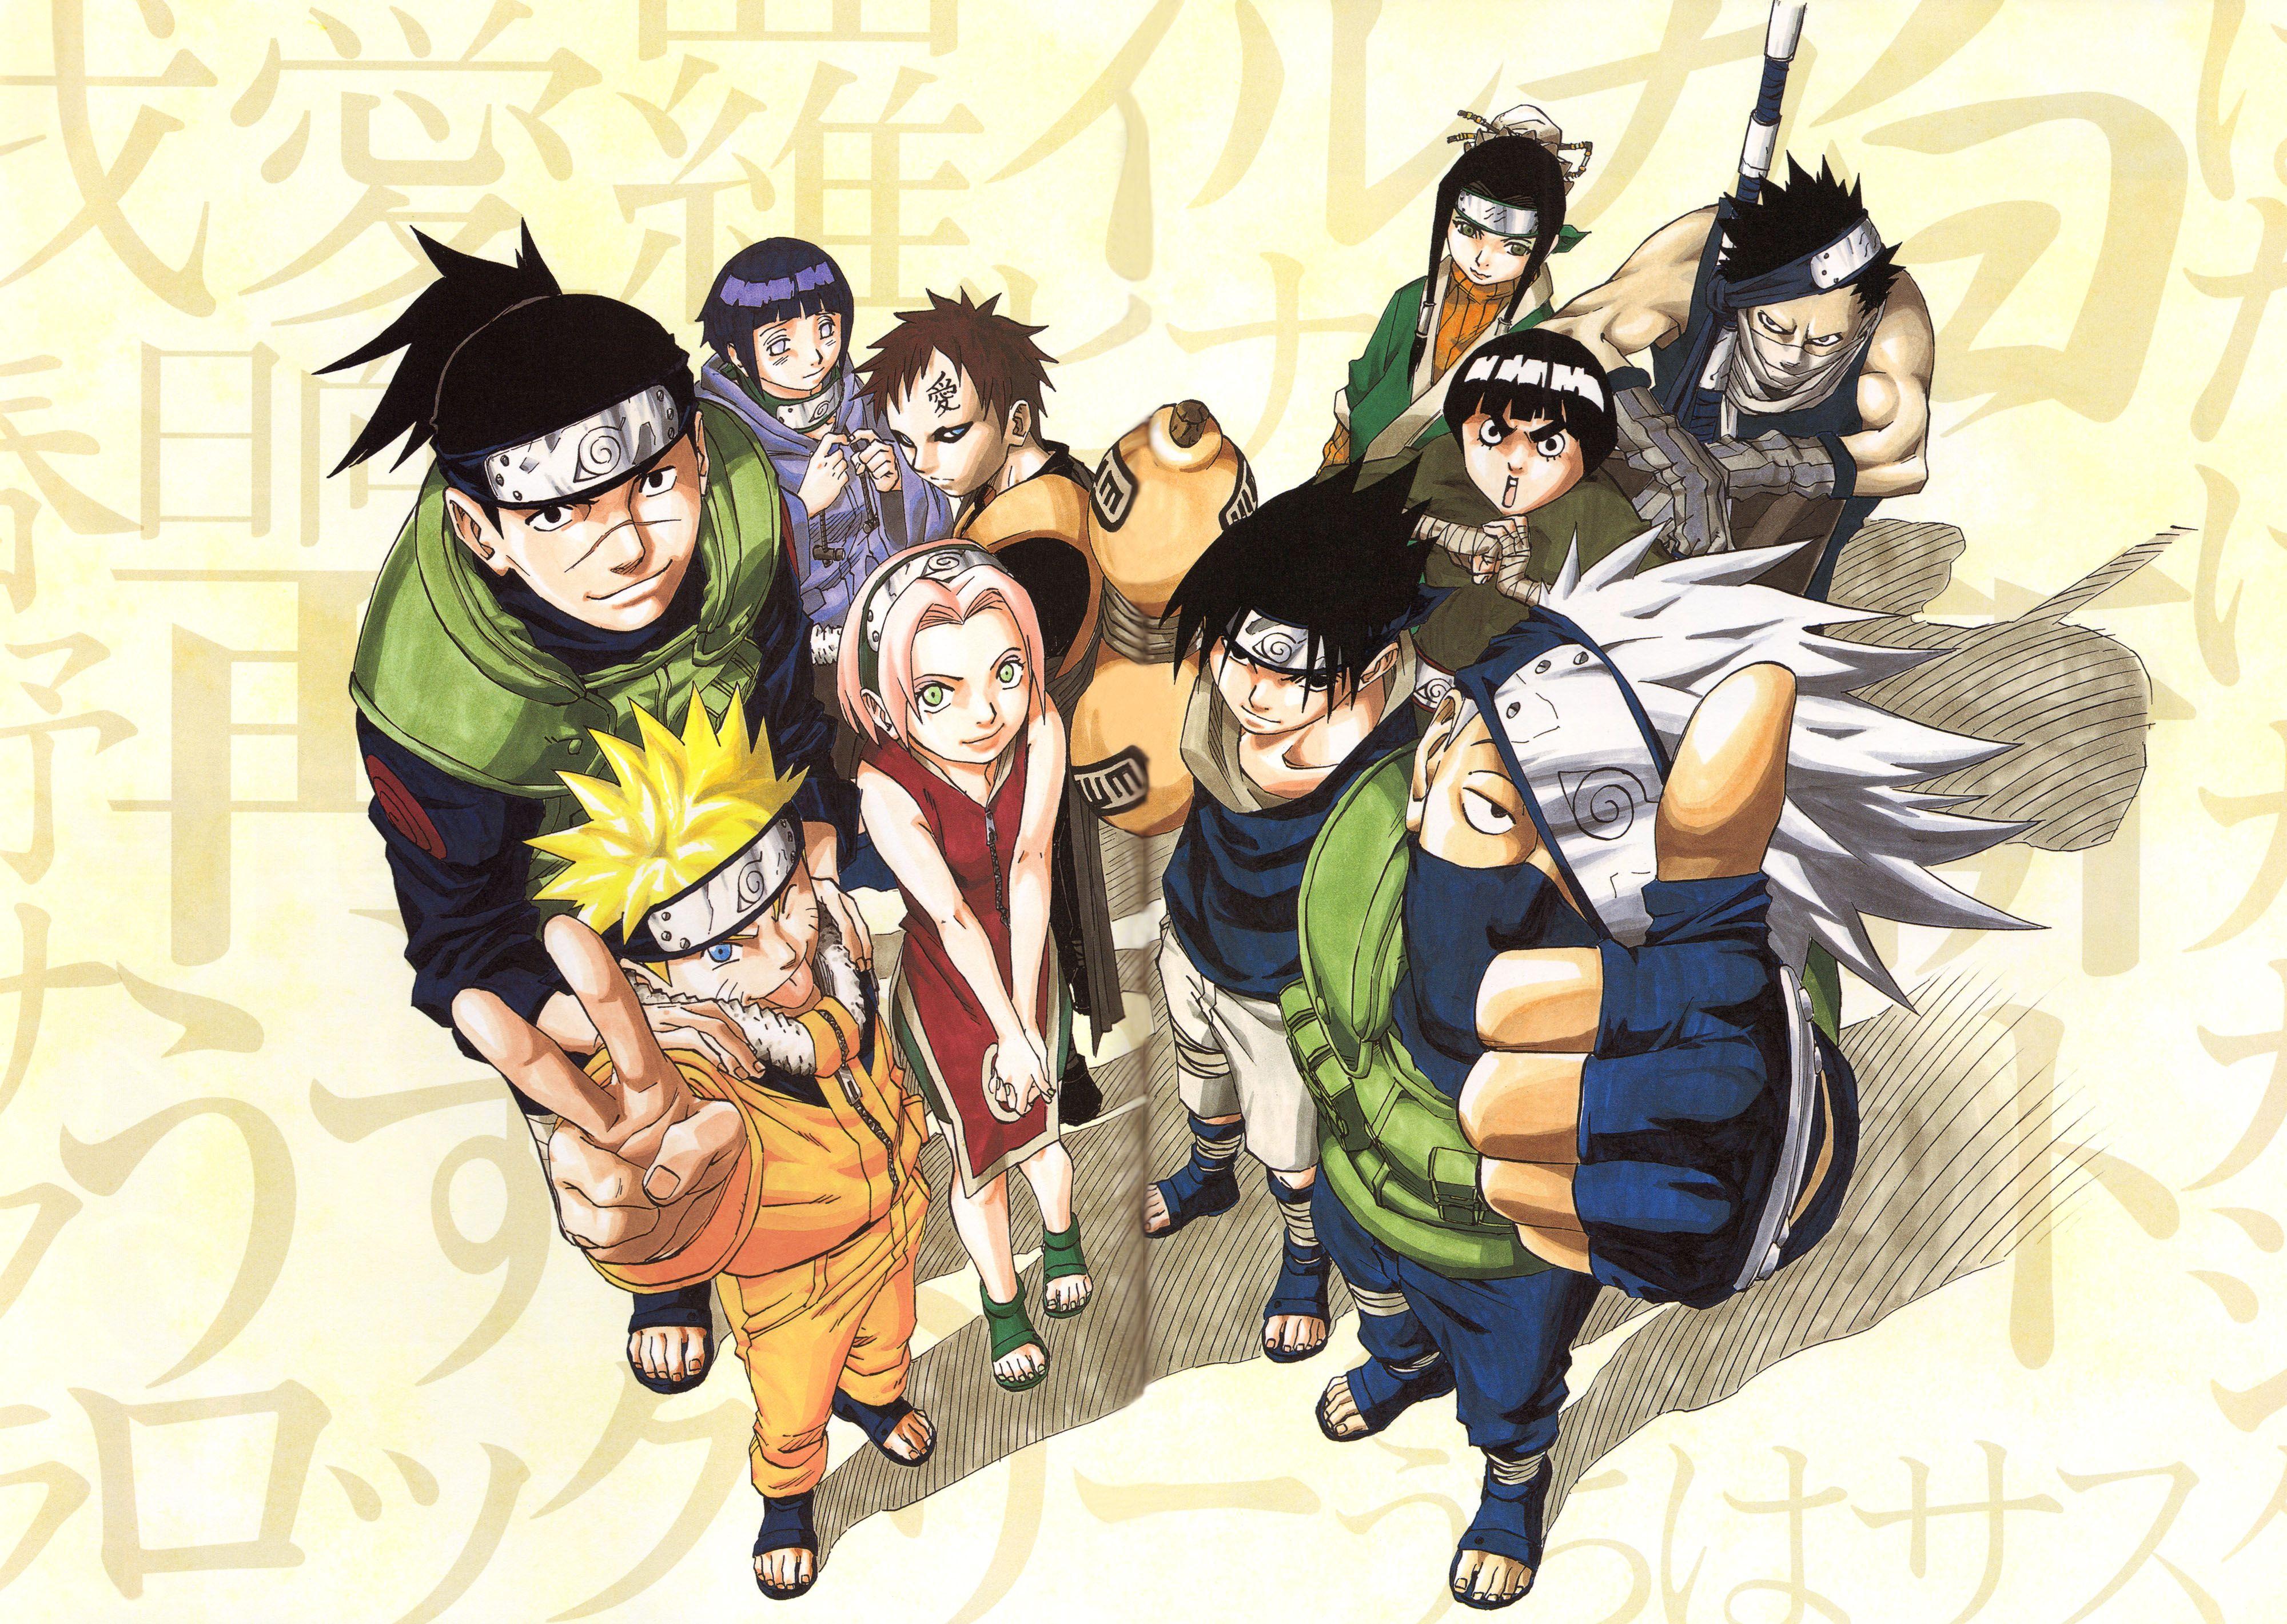 Naruto Computer Wallpapers Desktop Backgrounds 4000x2841 Id 516246 Anime Naruto Anime Naruto Wallpaper